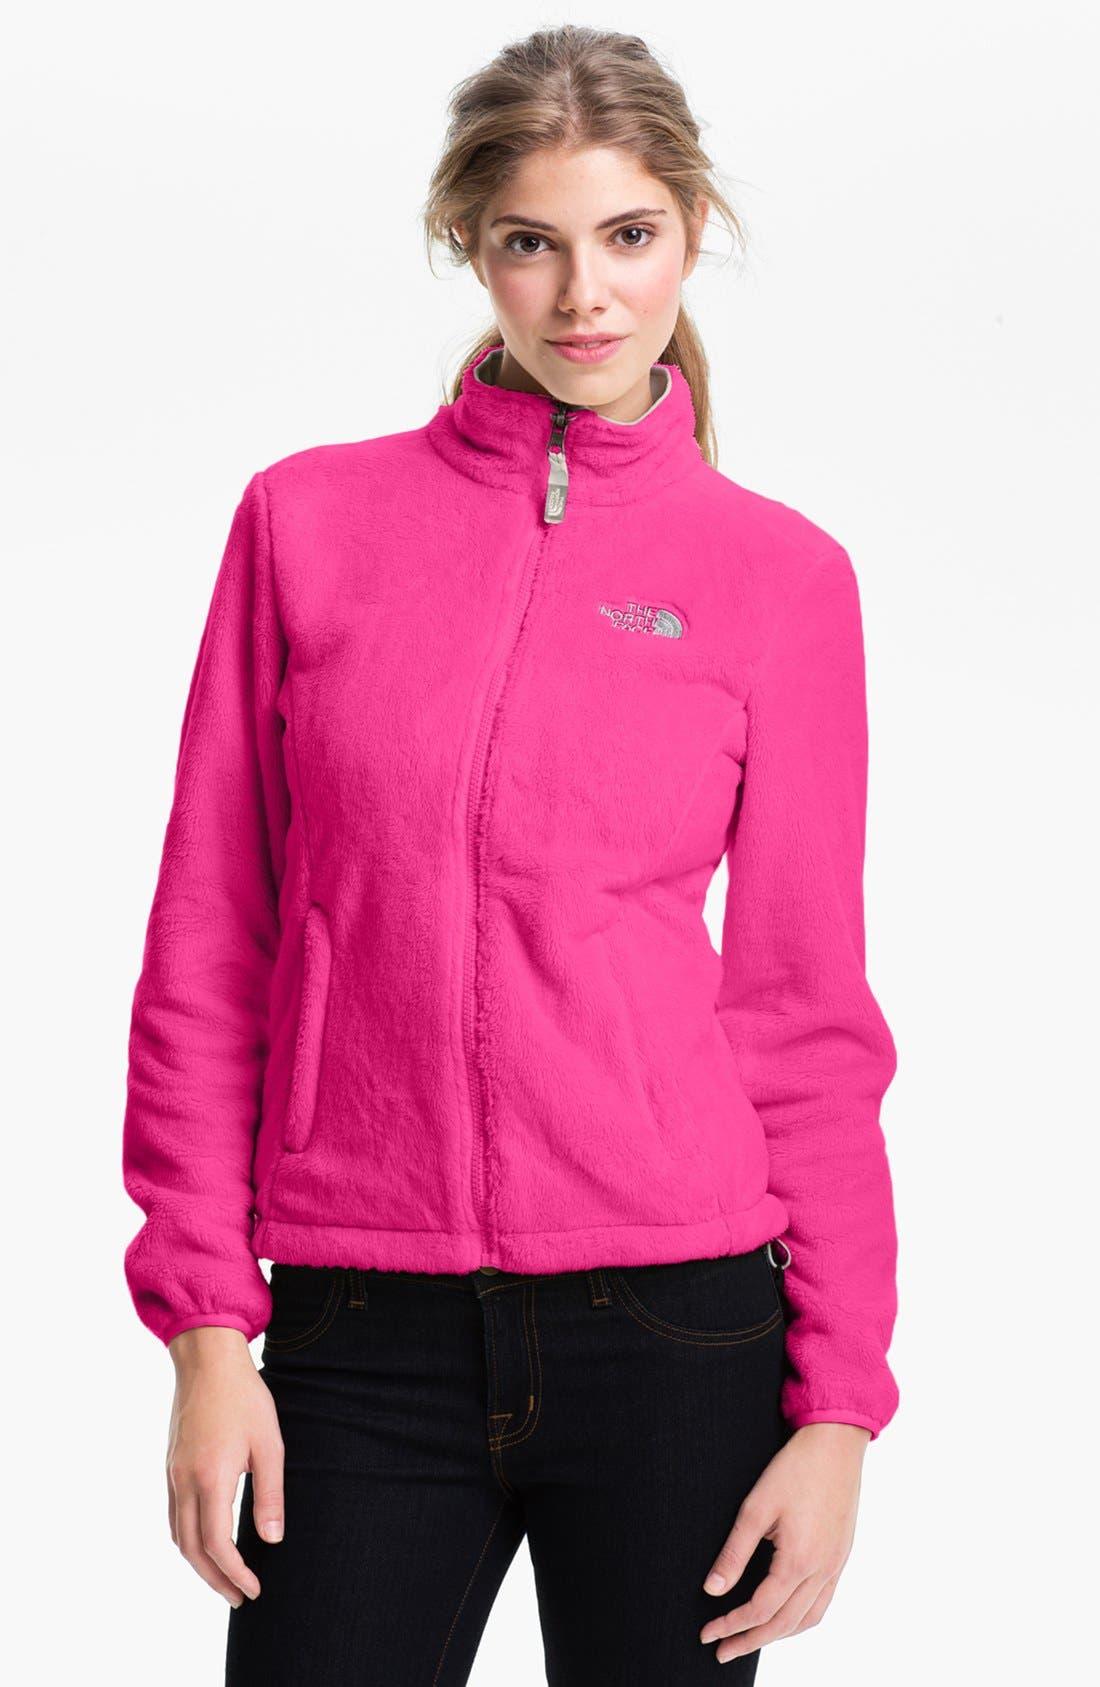 Main Image - The North Face 'Osito' Fleece Jacket